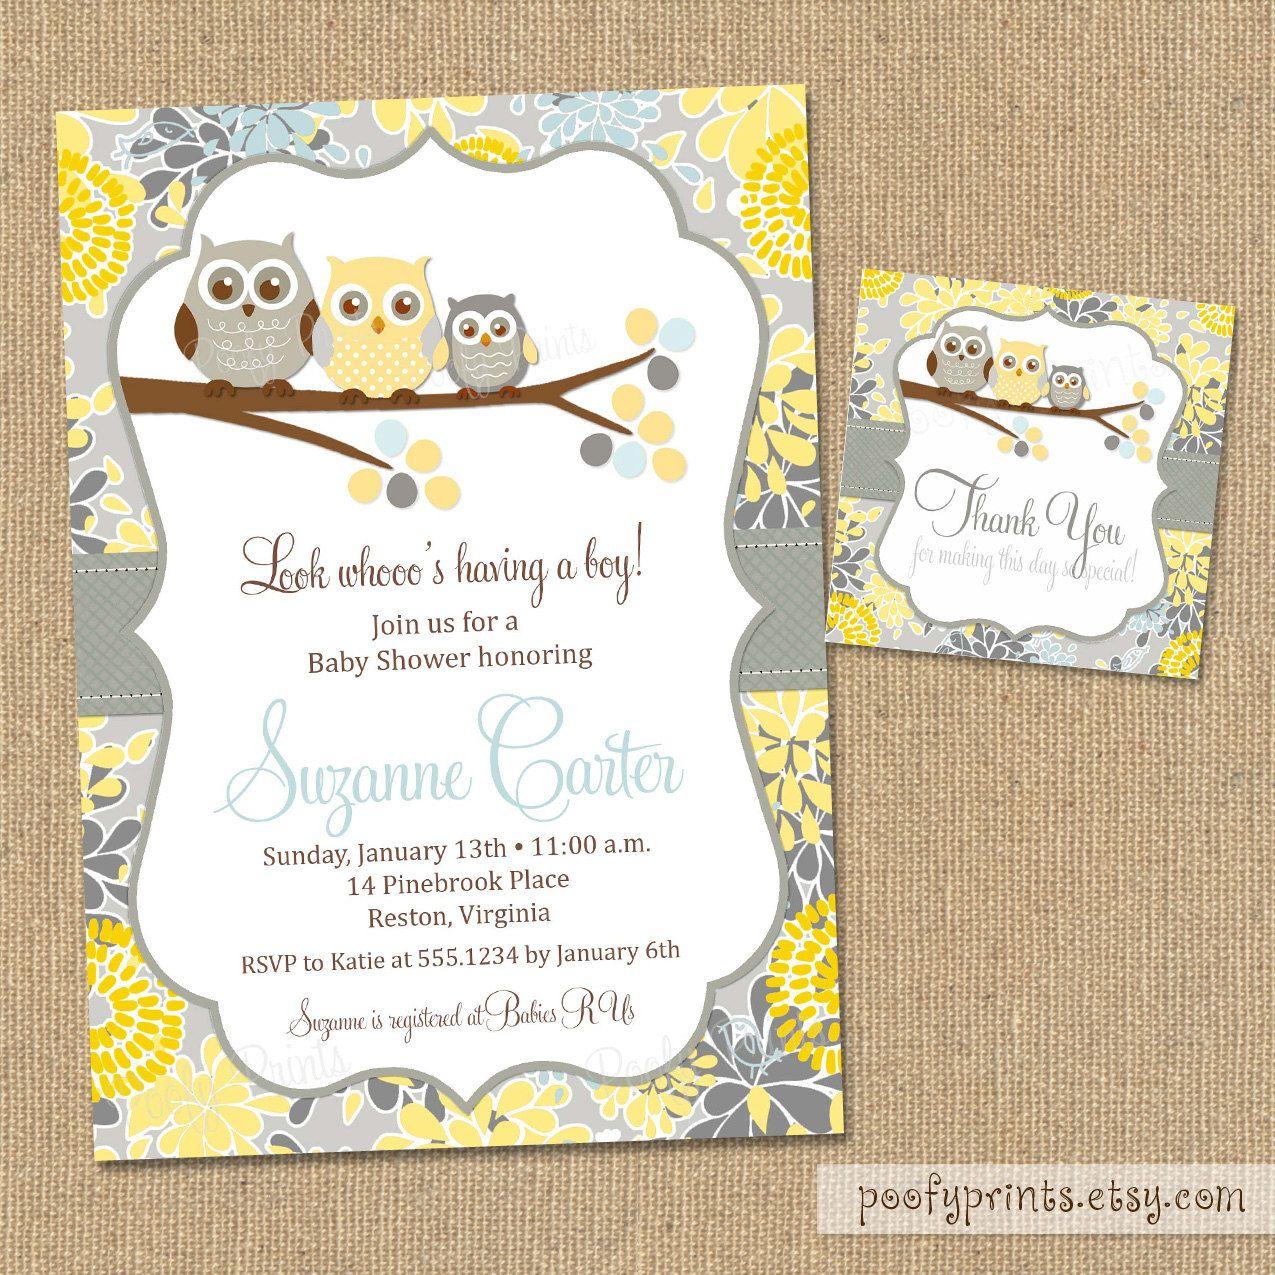 Owl baby shower invitations diy printable baby boy shower owl baby shower invitations diy printable baby boy shower invitations free matching thank you filmwisefo